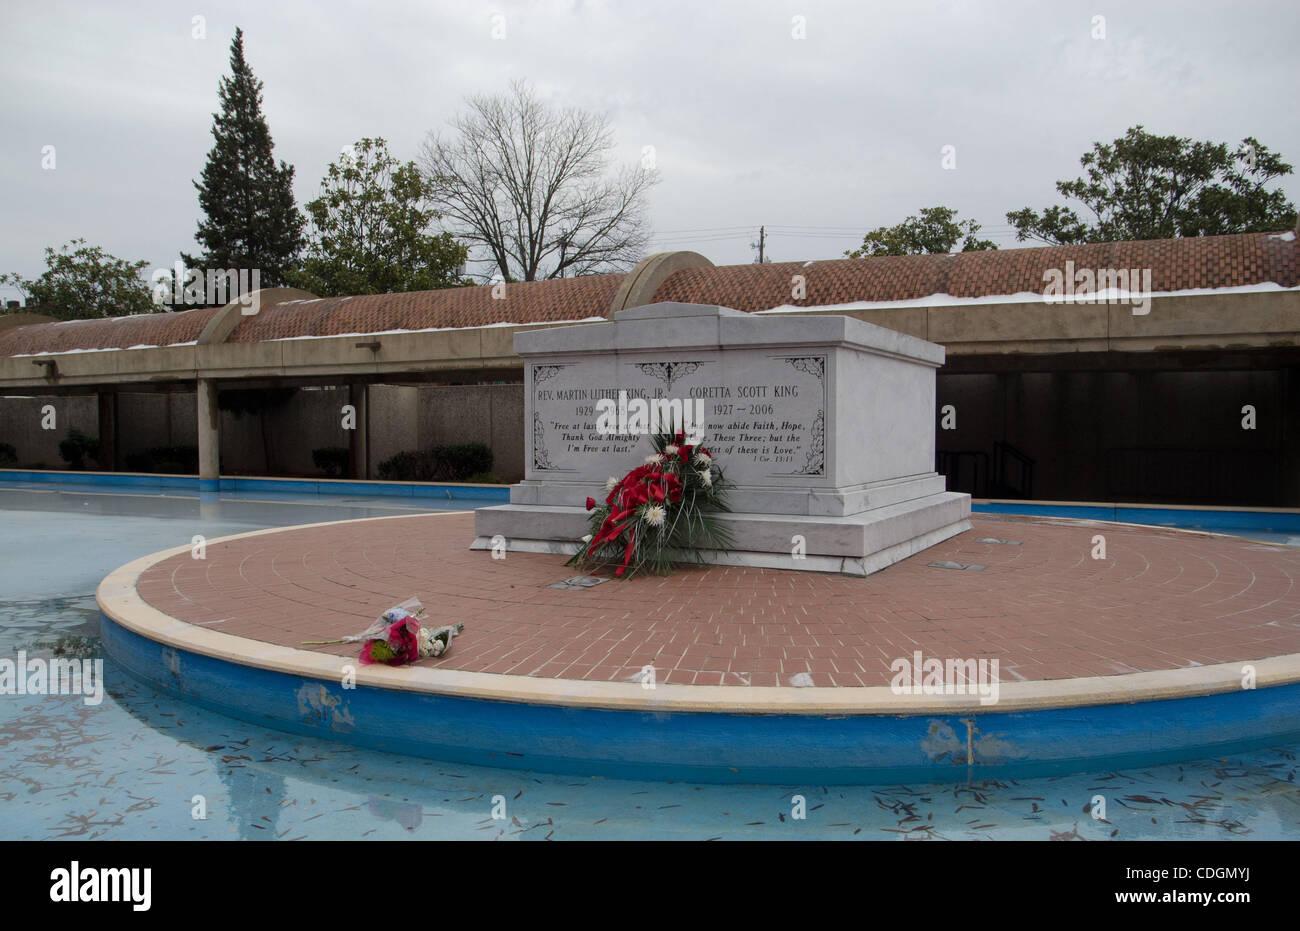 Jan 17 2011 Atlanta Georgia U S A Wreath And Flowers Adorn